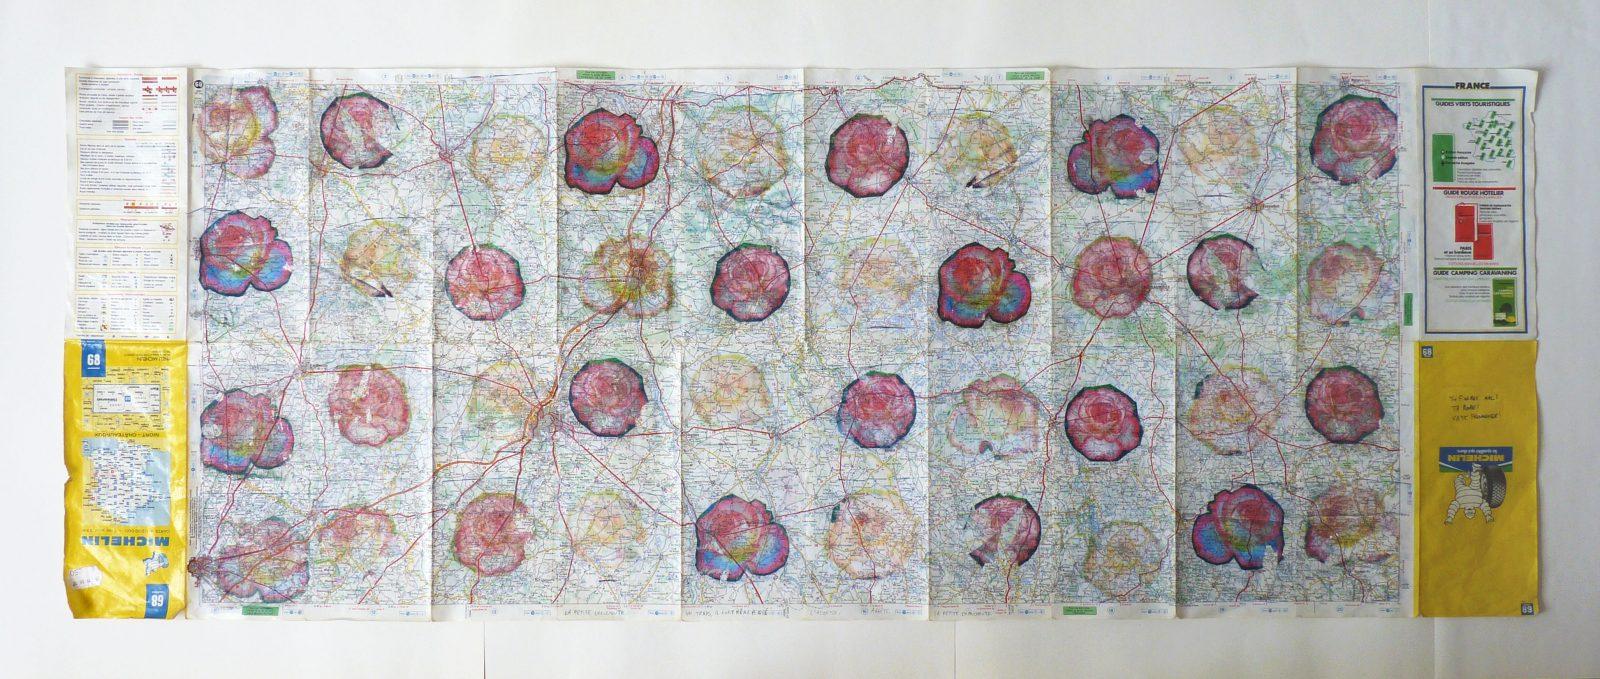 12-tu-finiras-mal-ta-robe-va-te-promoner-131,5 x 24,9 cm-2017